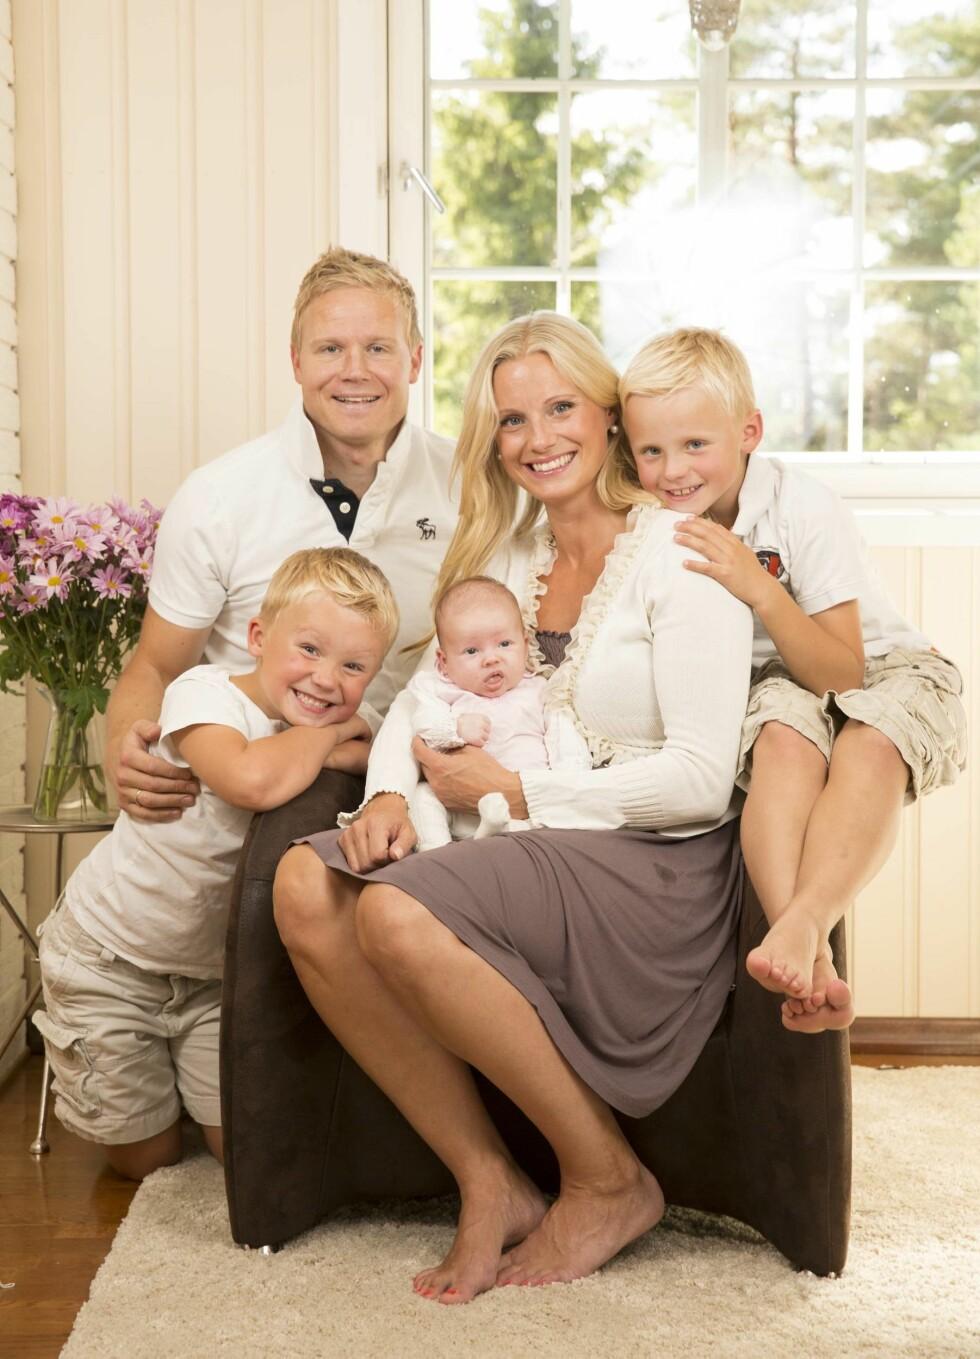 FAMILIEN: Silje Sandmæl koser seg i Bærum sammen med mann og deres tre barn. Paret møttes i San Francisco.  Foto: Morten Eik, Se og Hør